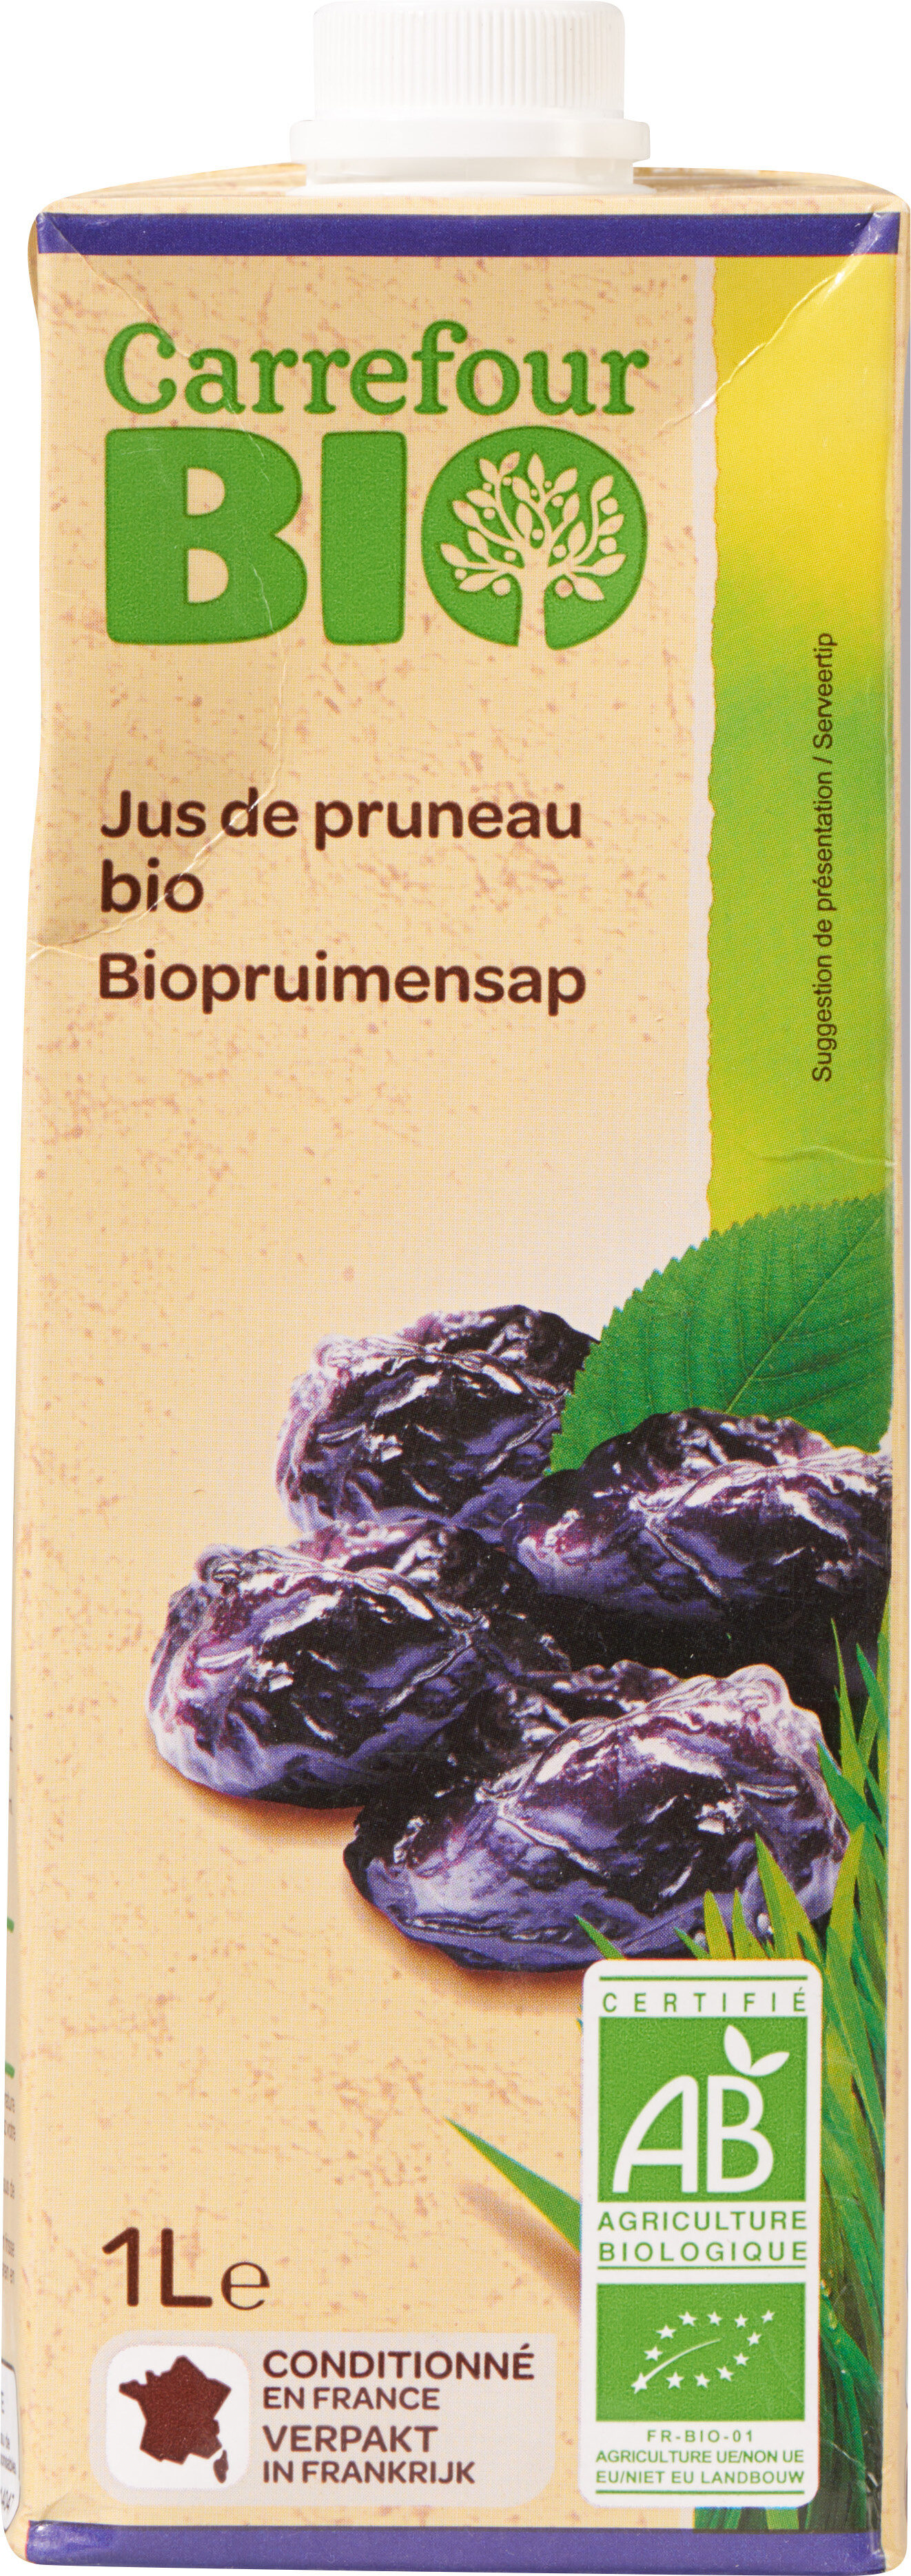 Jus de pruneau bio - Prodotto - fr